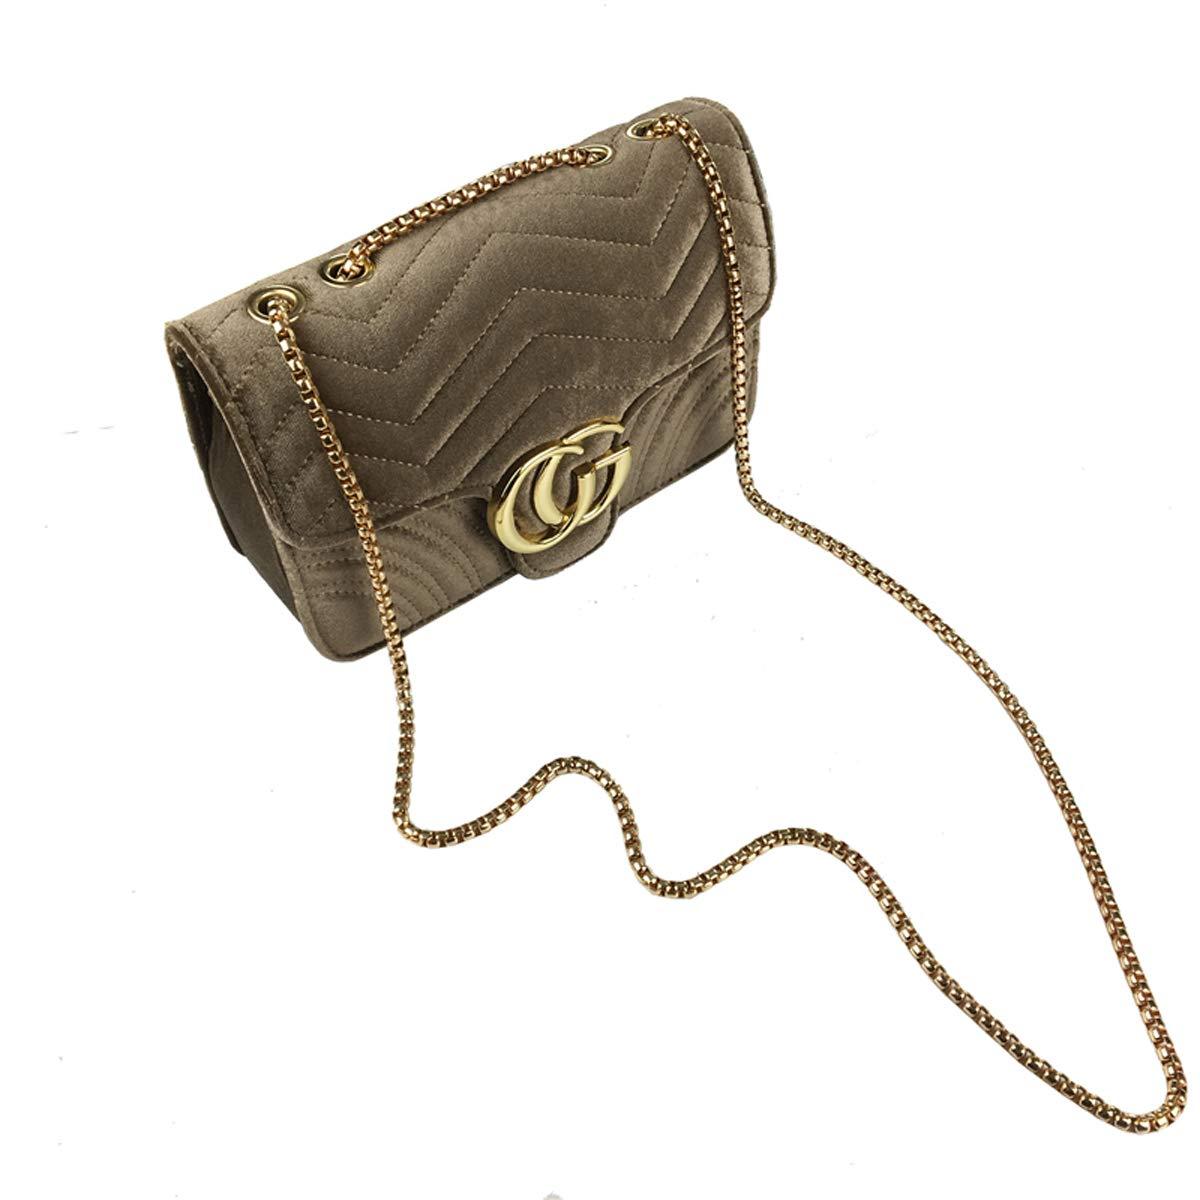 e9a5ee2e8ff5 SHRJJ 2018 Girls Fashion CG Lock Velvet High Quality Leather Shoulder Bag  Crossbody Bag Wave Pattern Vintage e Small Bag Large Space Baby Diaper Bag  for ...